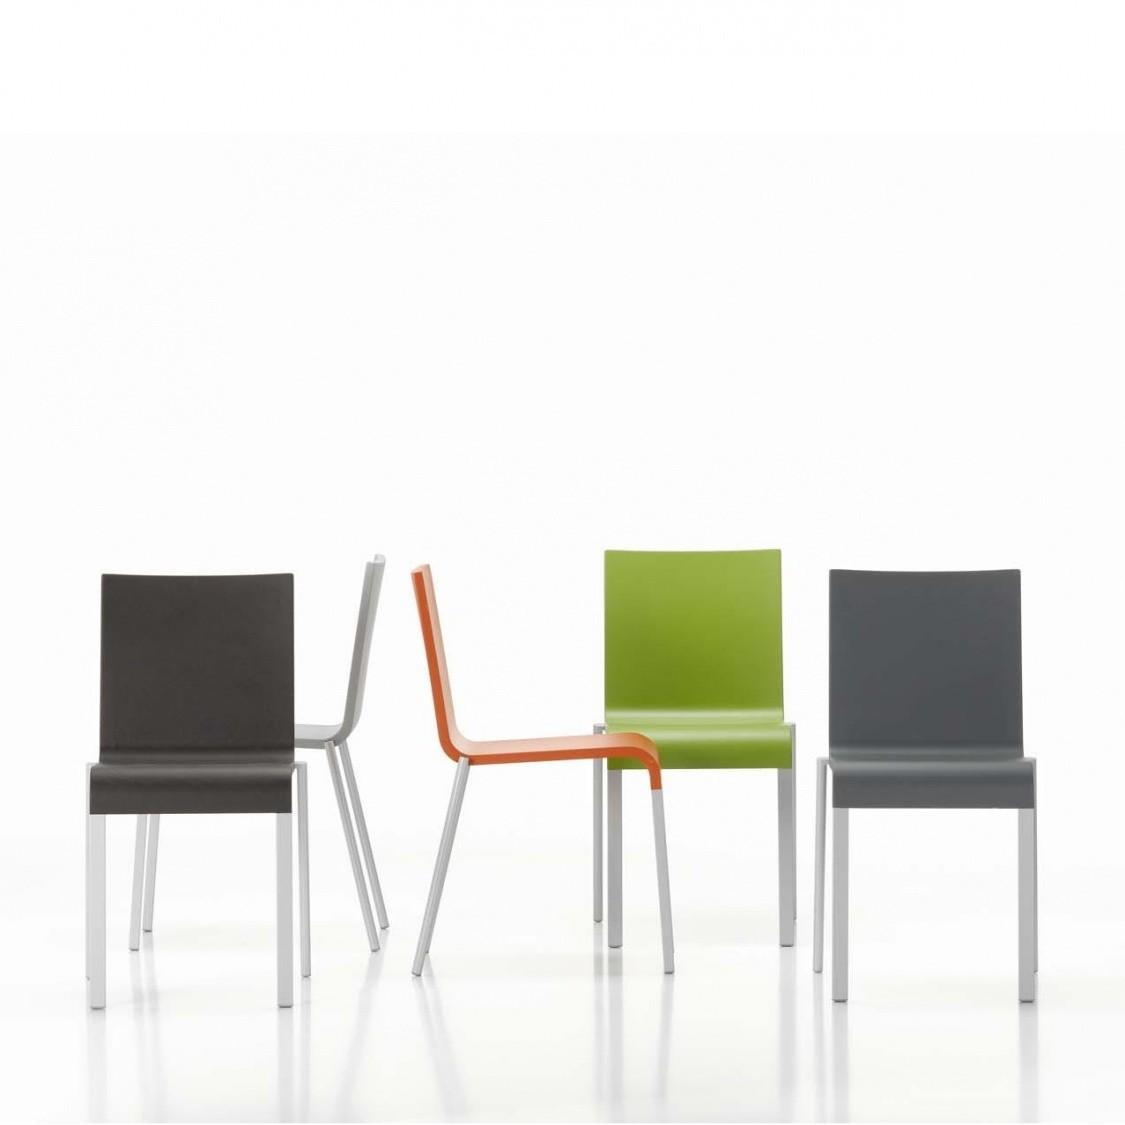 Designer stuhl vitra vitra sessel nachbau awesome design for Panton chair nachbau